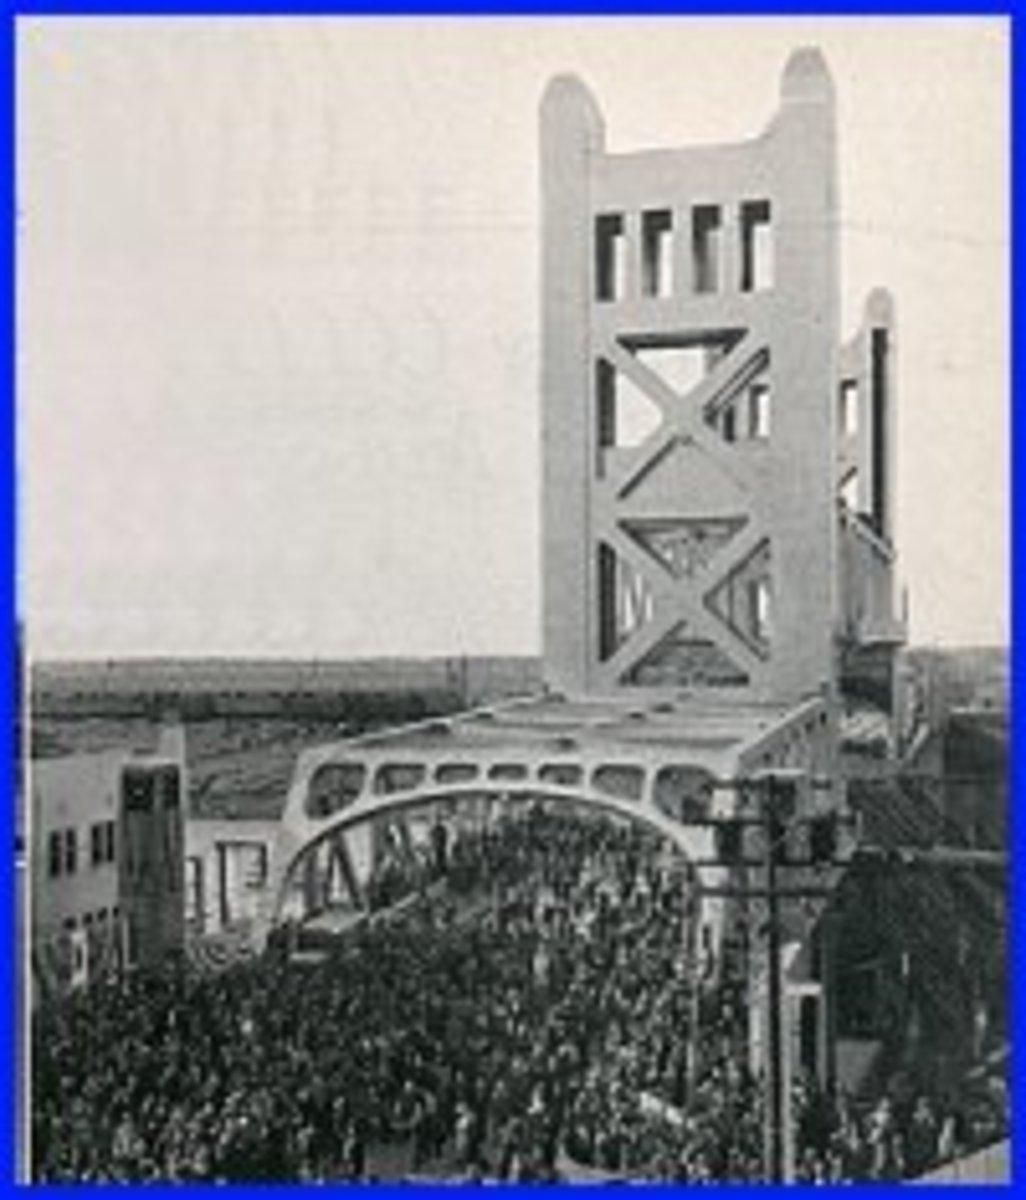 Sacramento Tower Bridge Dedication: 1935